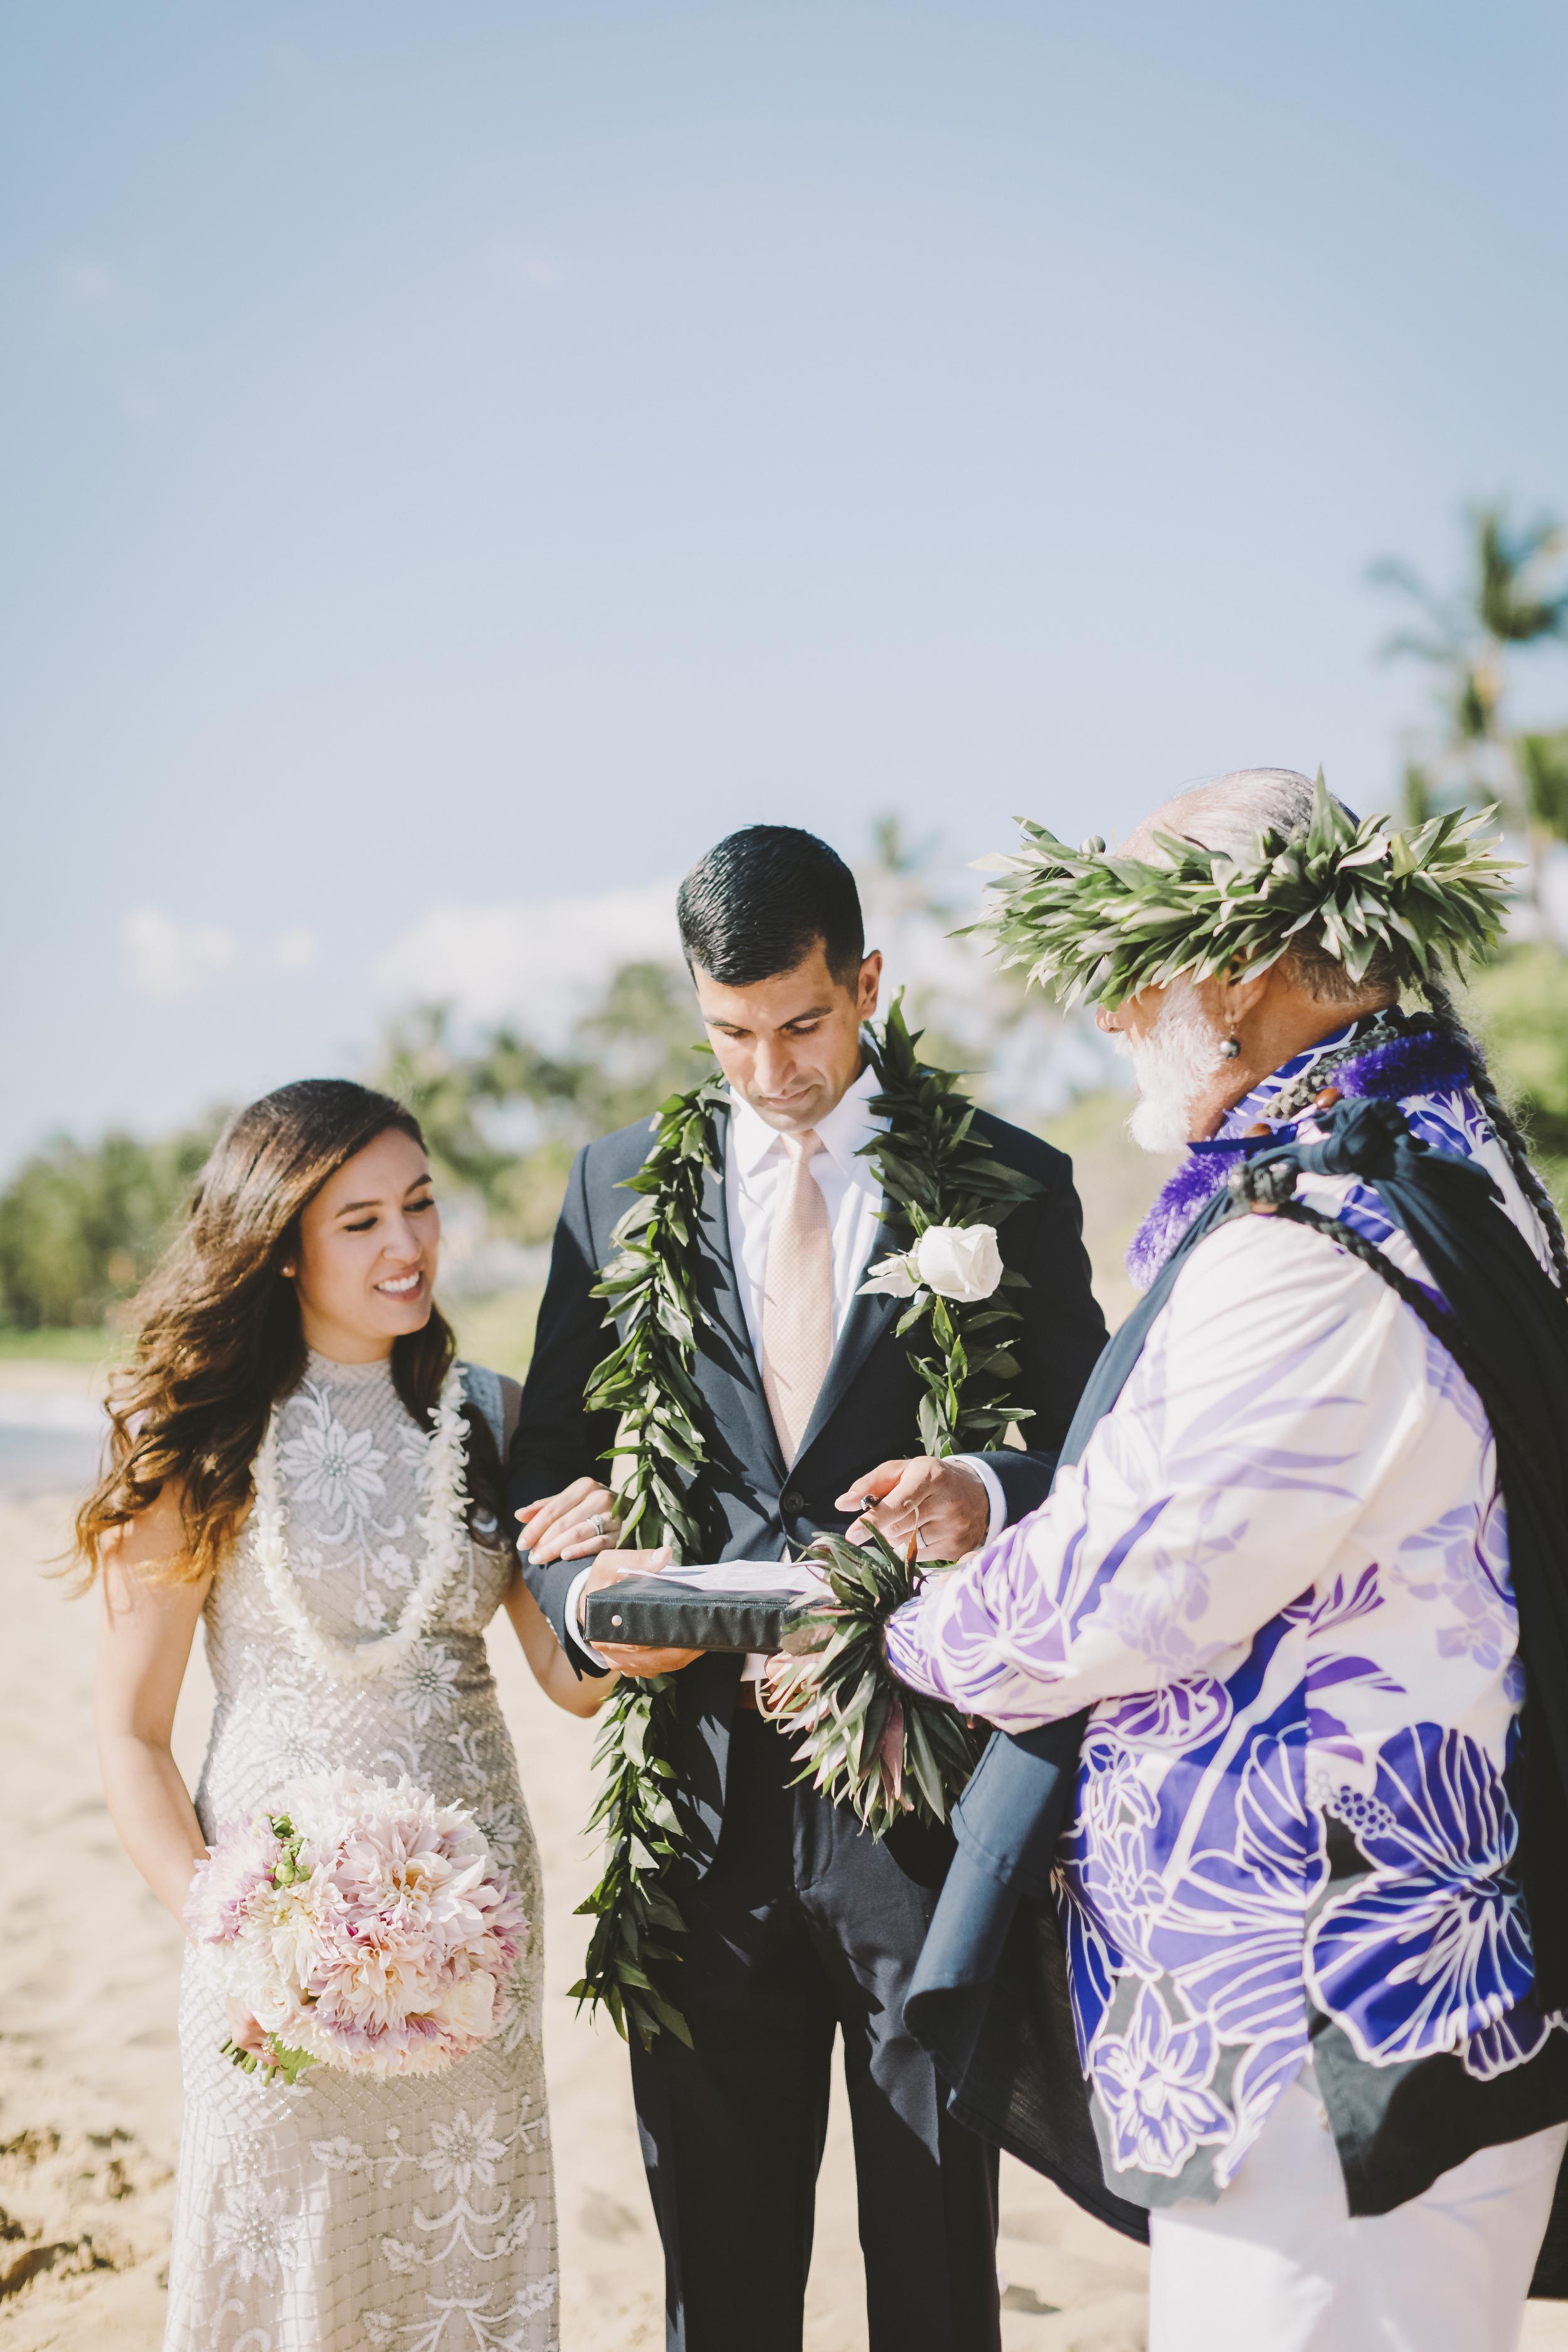 angie-diaz-photography-mokapu-beach-maui-elopement-36.jpg